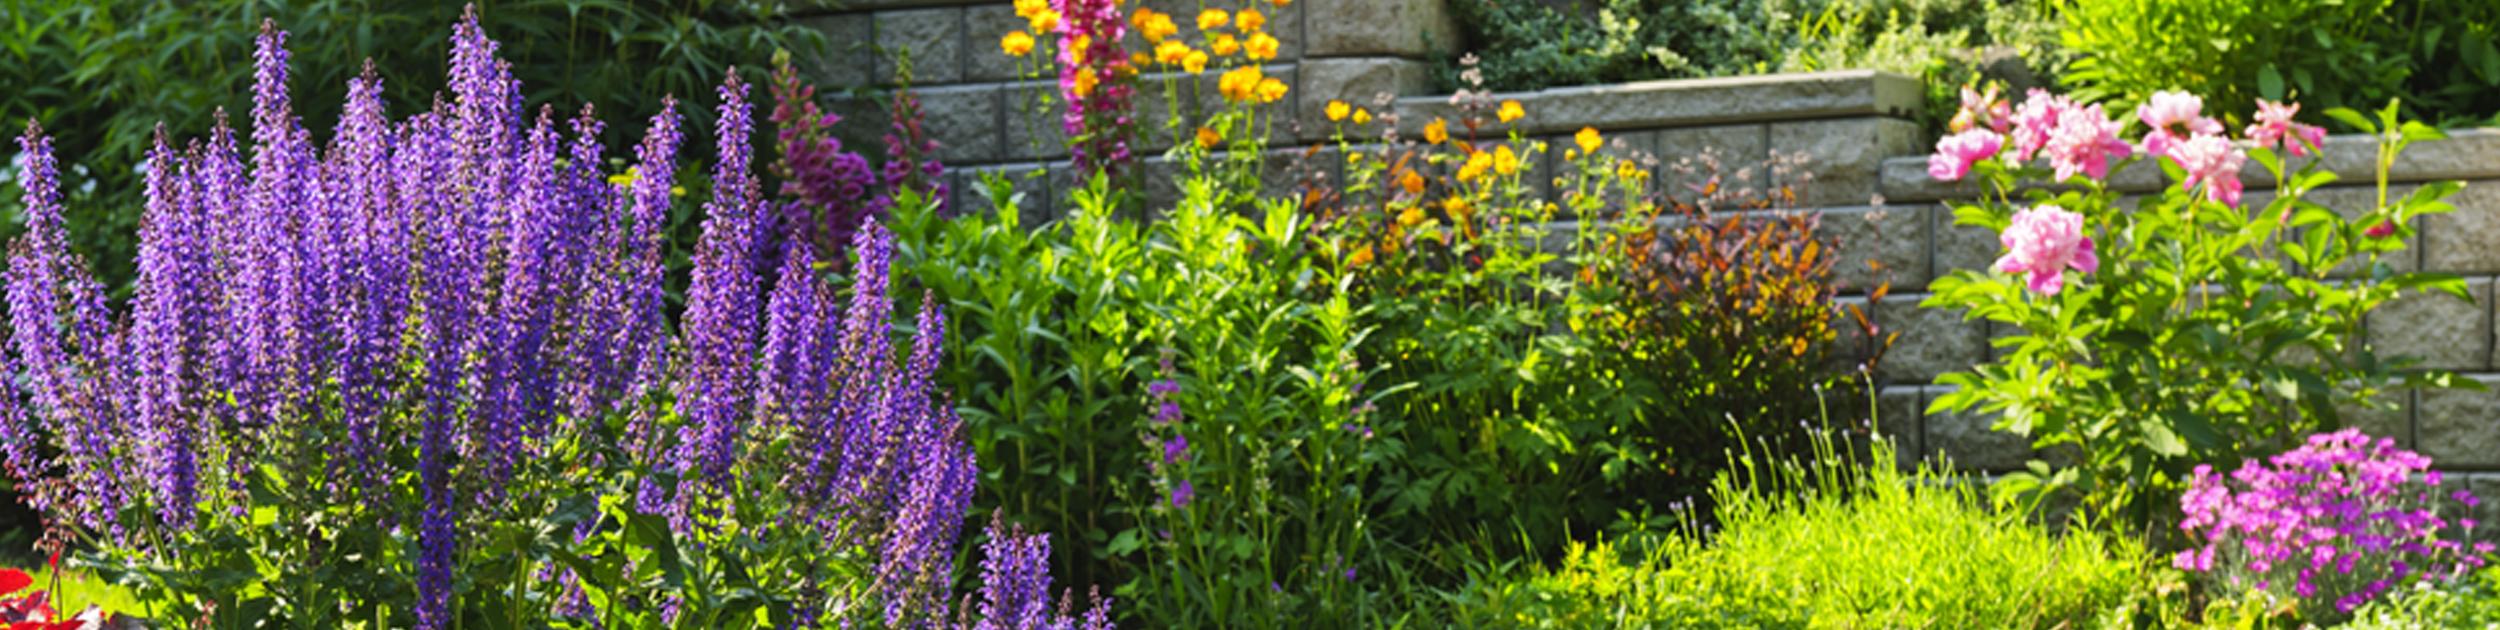 beautiful colorful summer flower garden